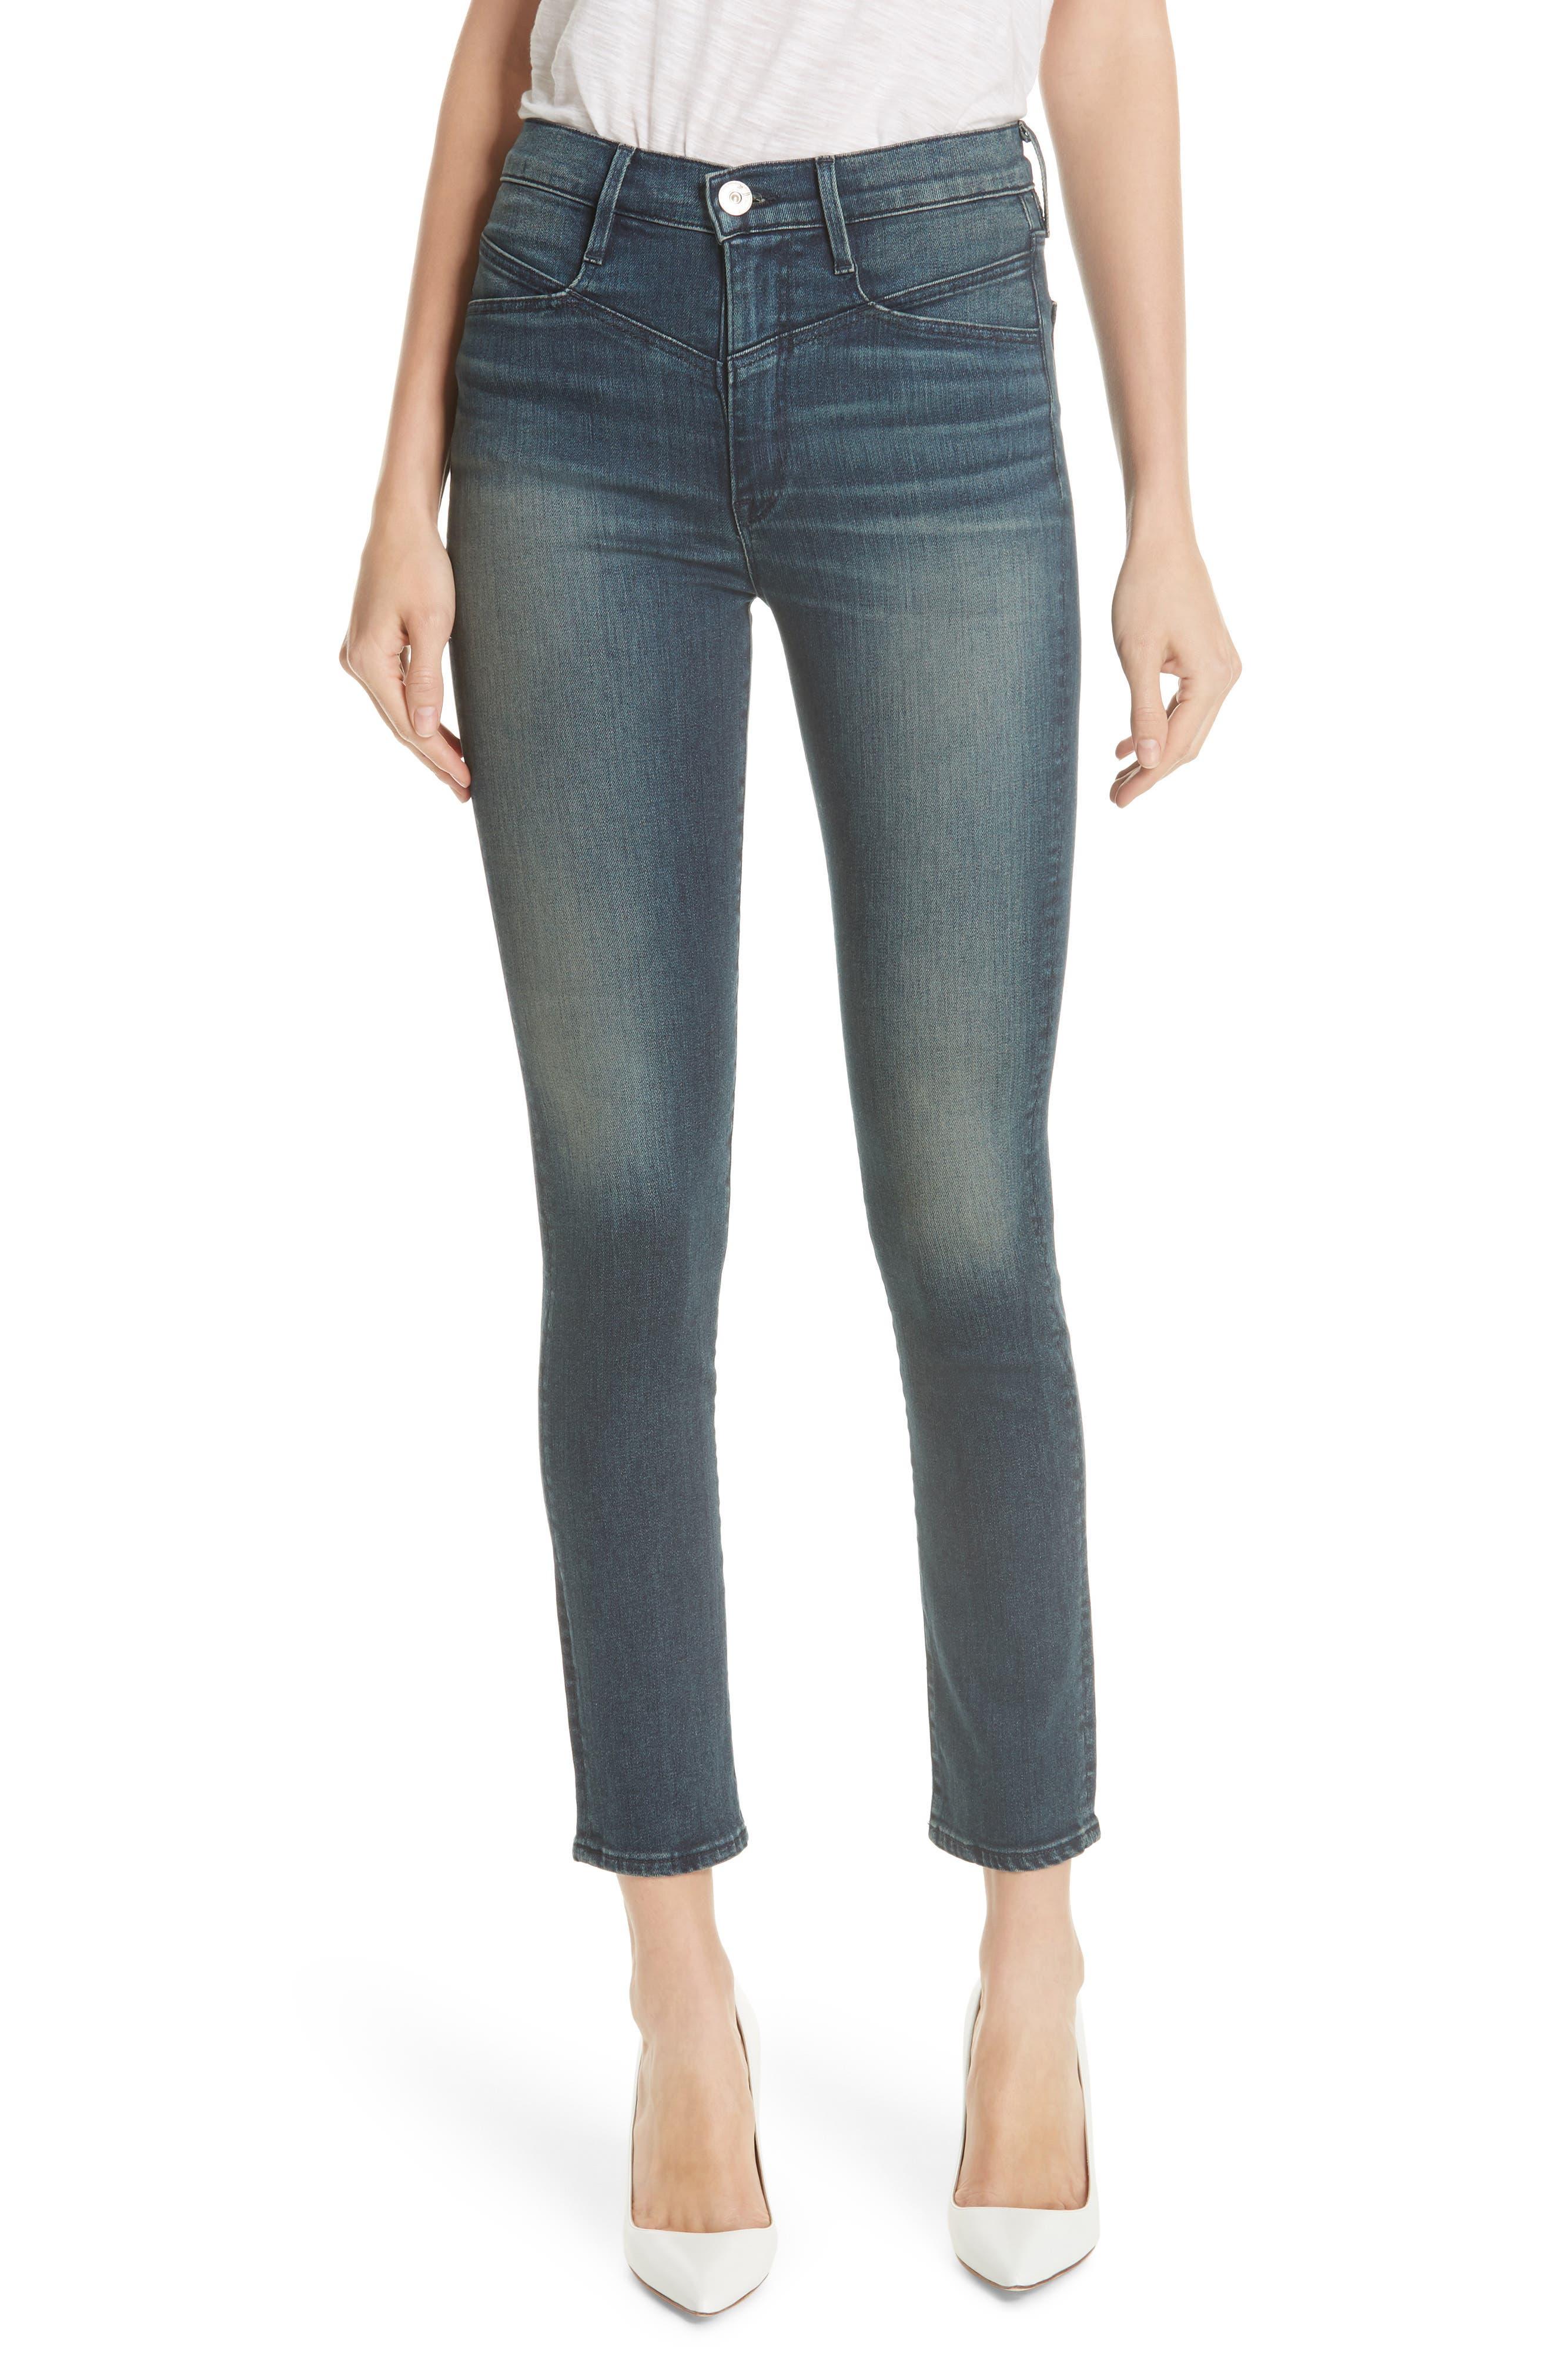 Higher Ground Jesse Straight Jeans in Lana Lana